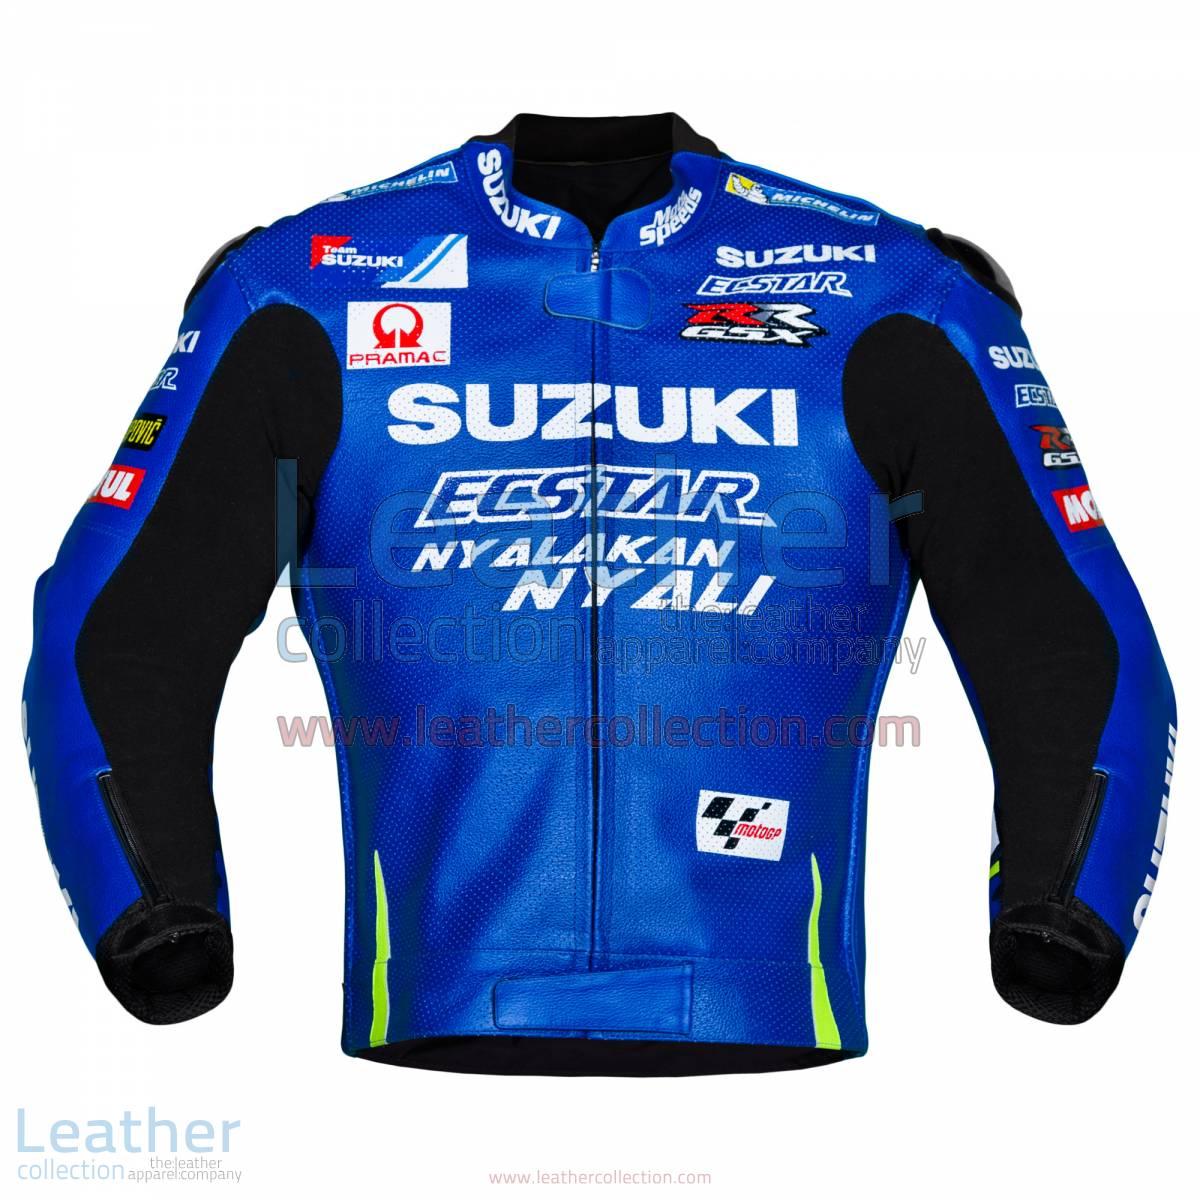 Andrea Iannone Suzuki MotoGP 2017 Leather Jacket   Andrea Iannone Suzuki MotoGP 2017 Leather Jacket